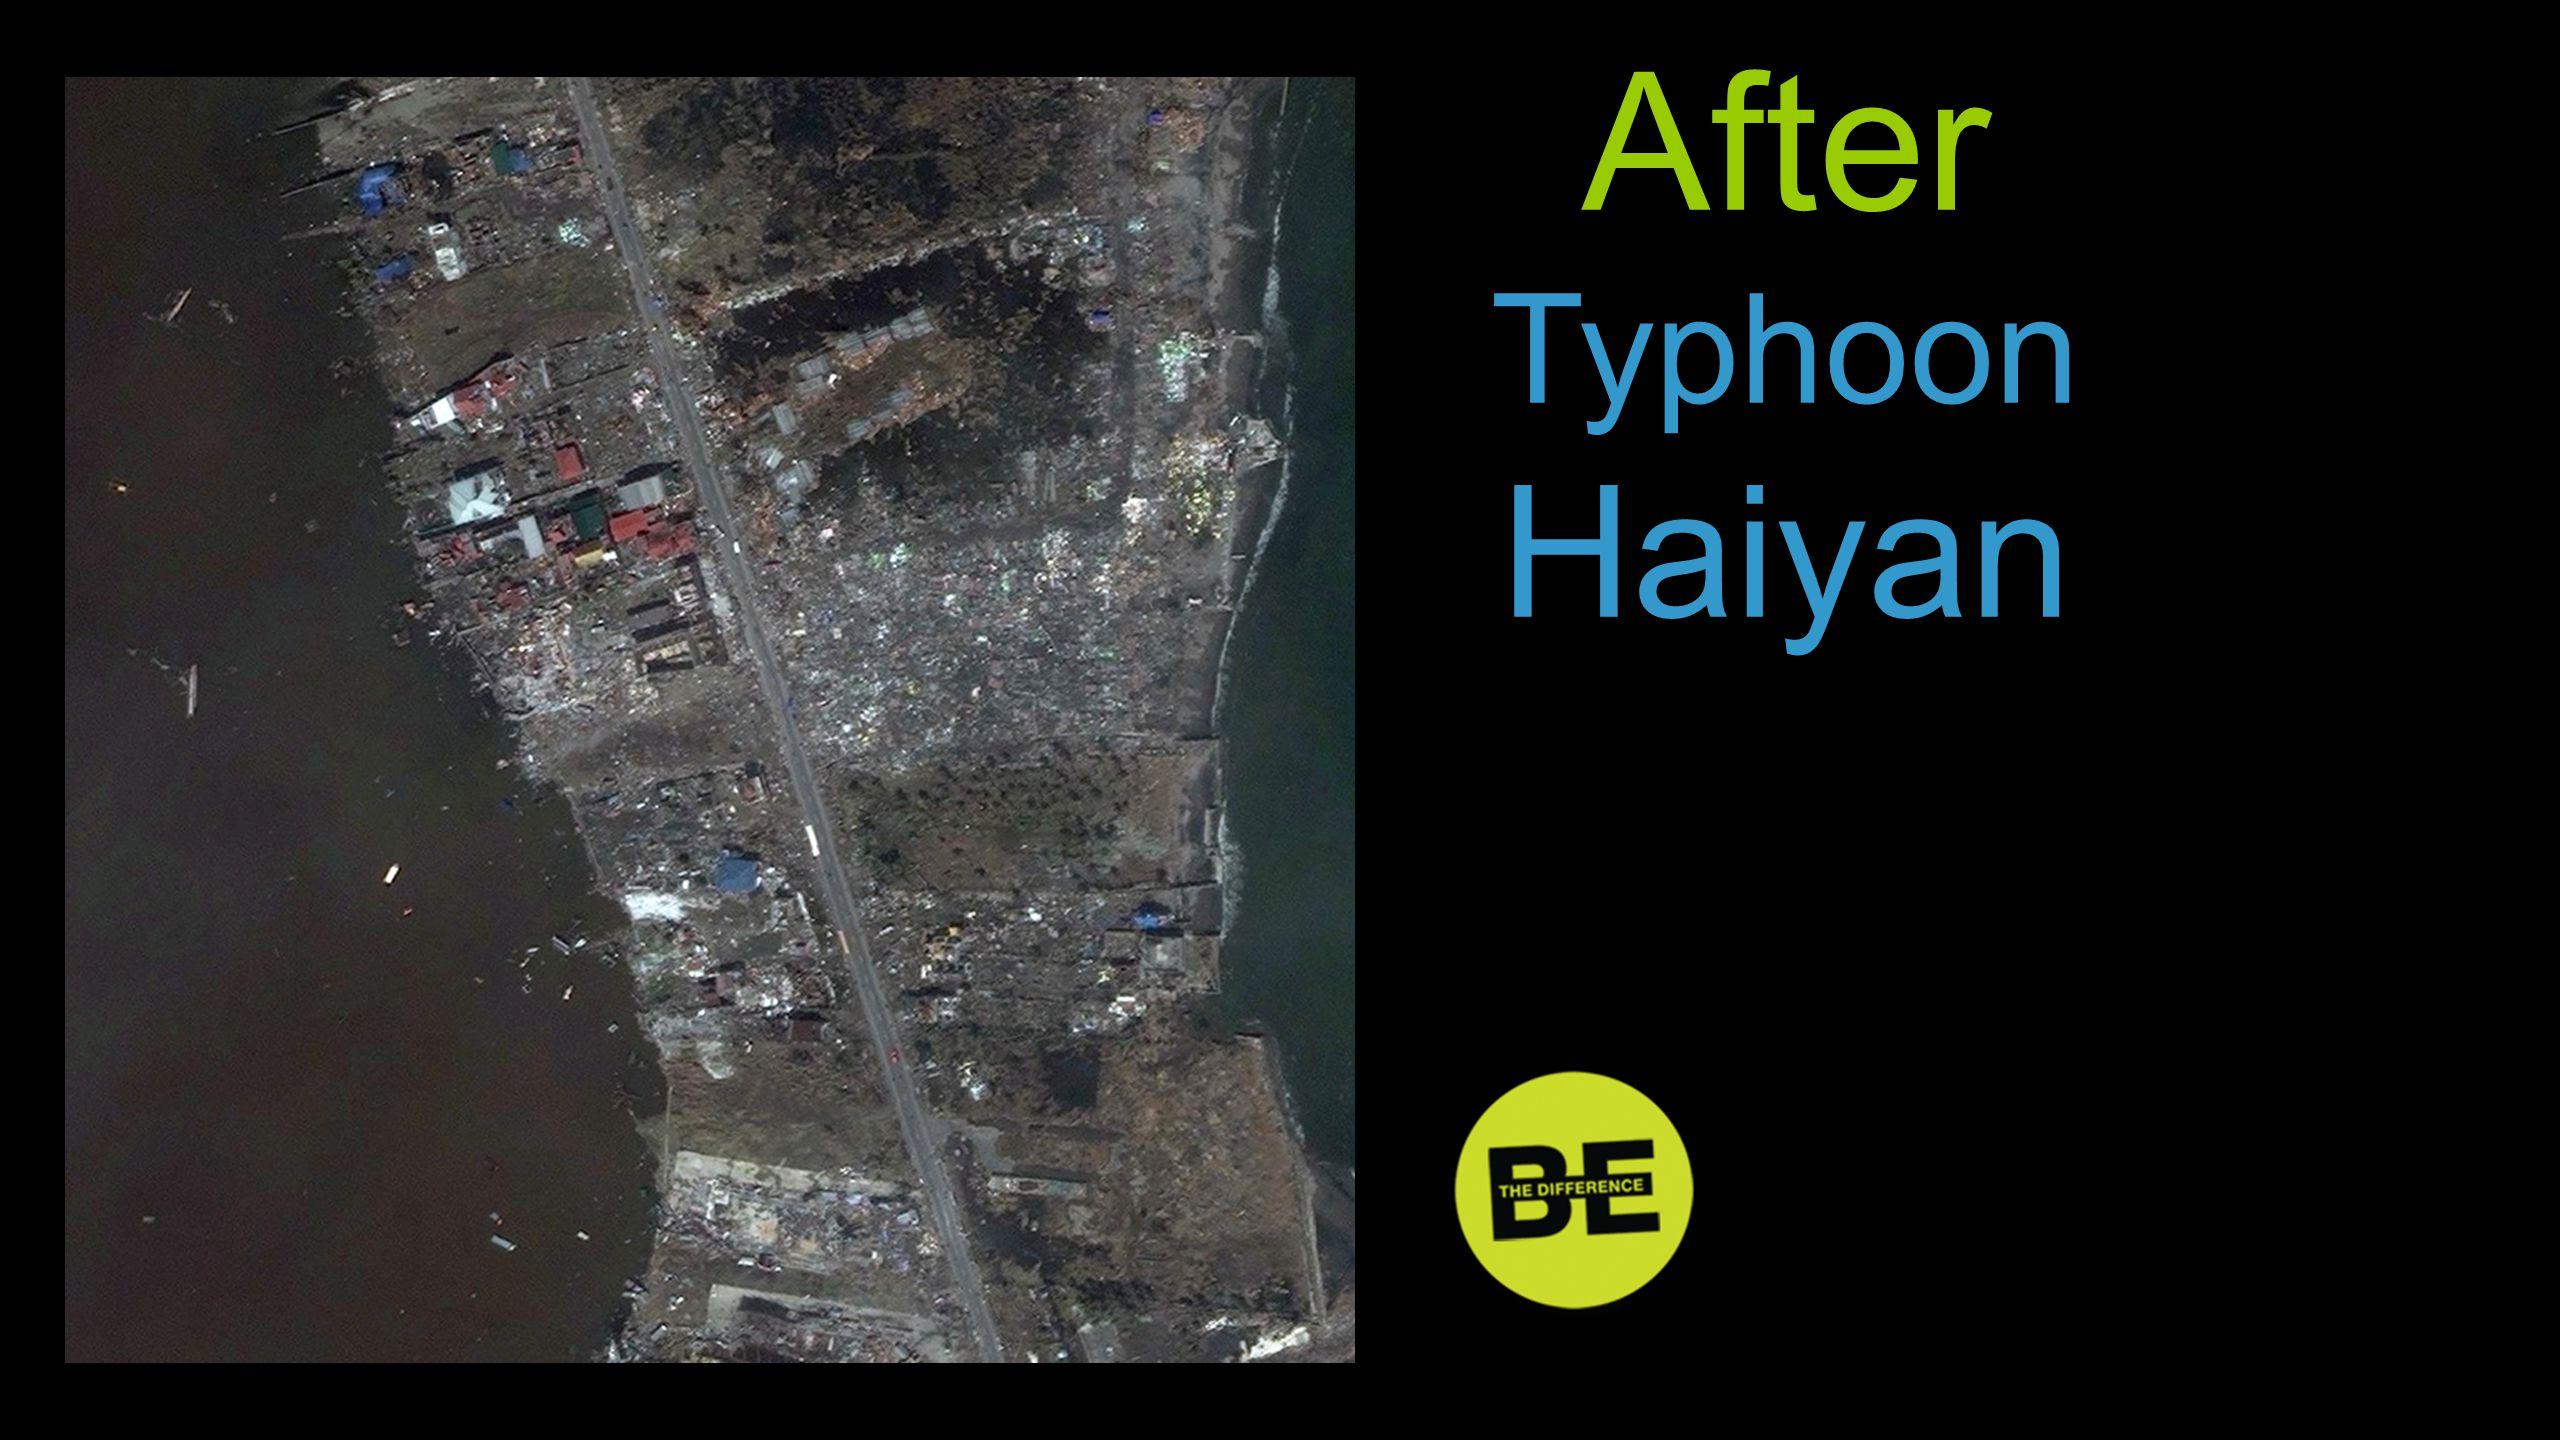 After Typhoon Haiyan